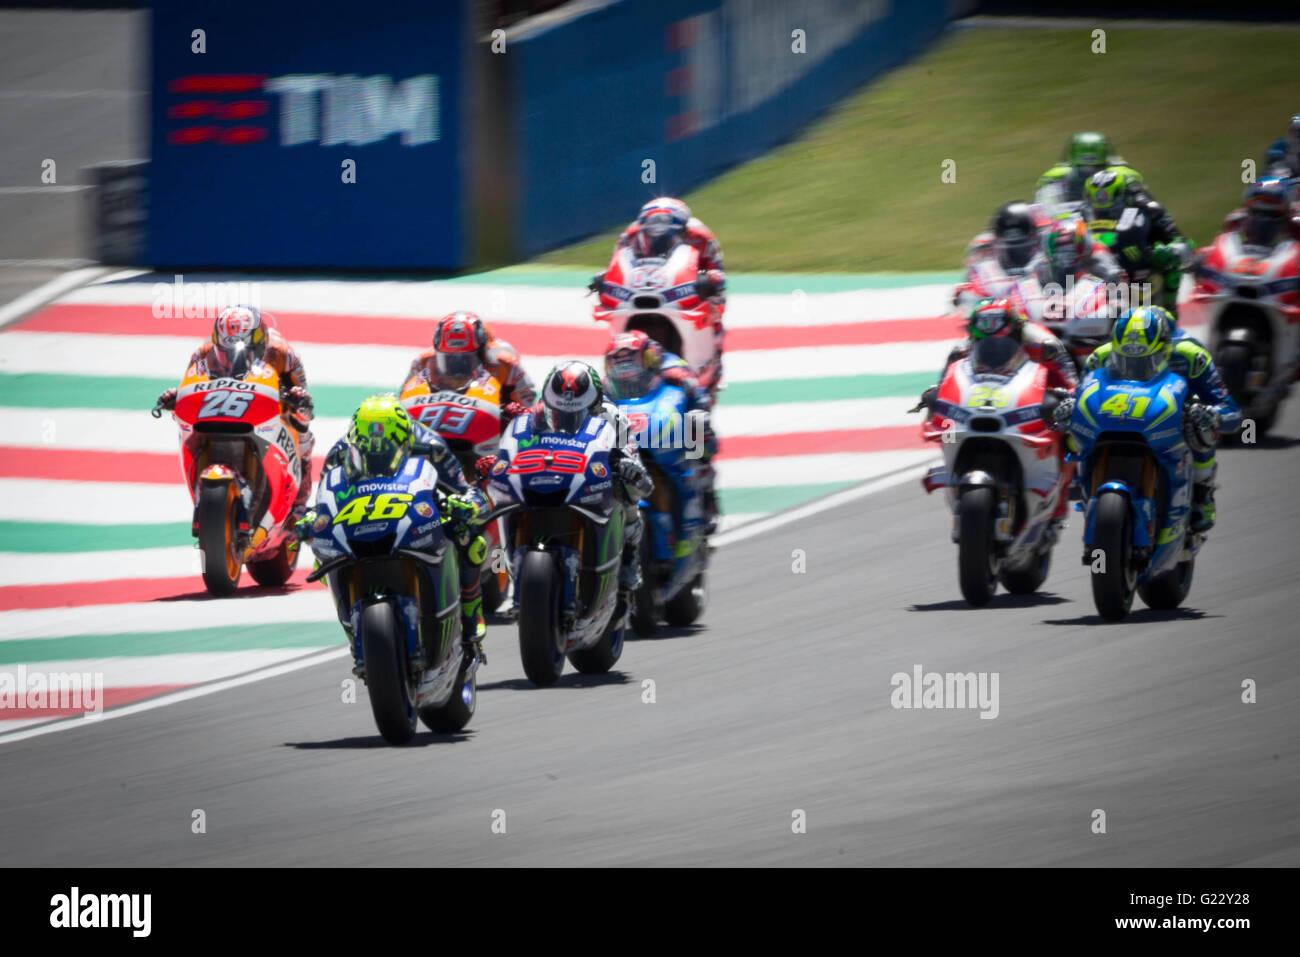 Circuit Italia Motogp : Mugello circuit tuscany italy nd may motogp